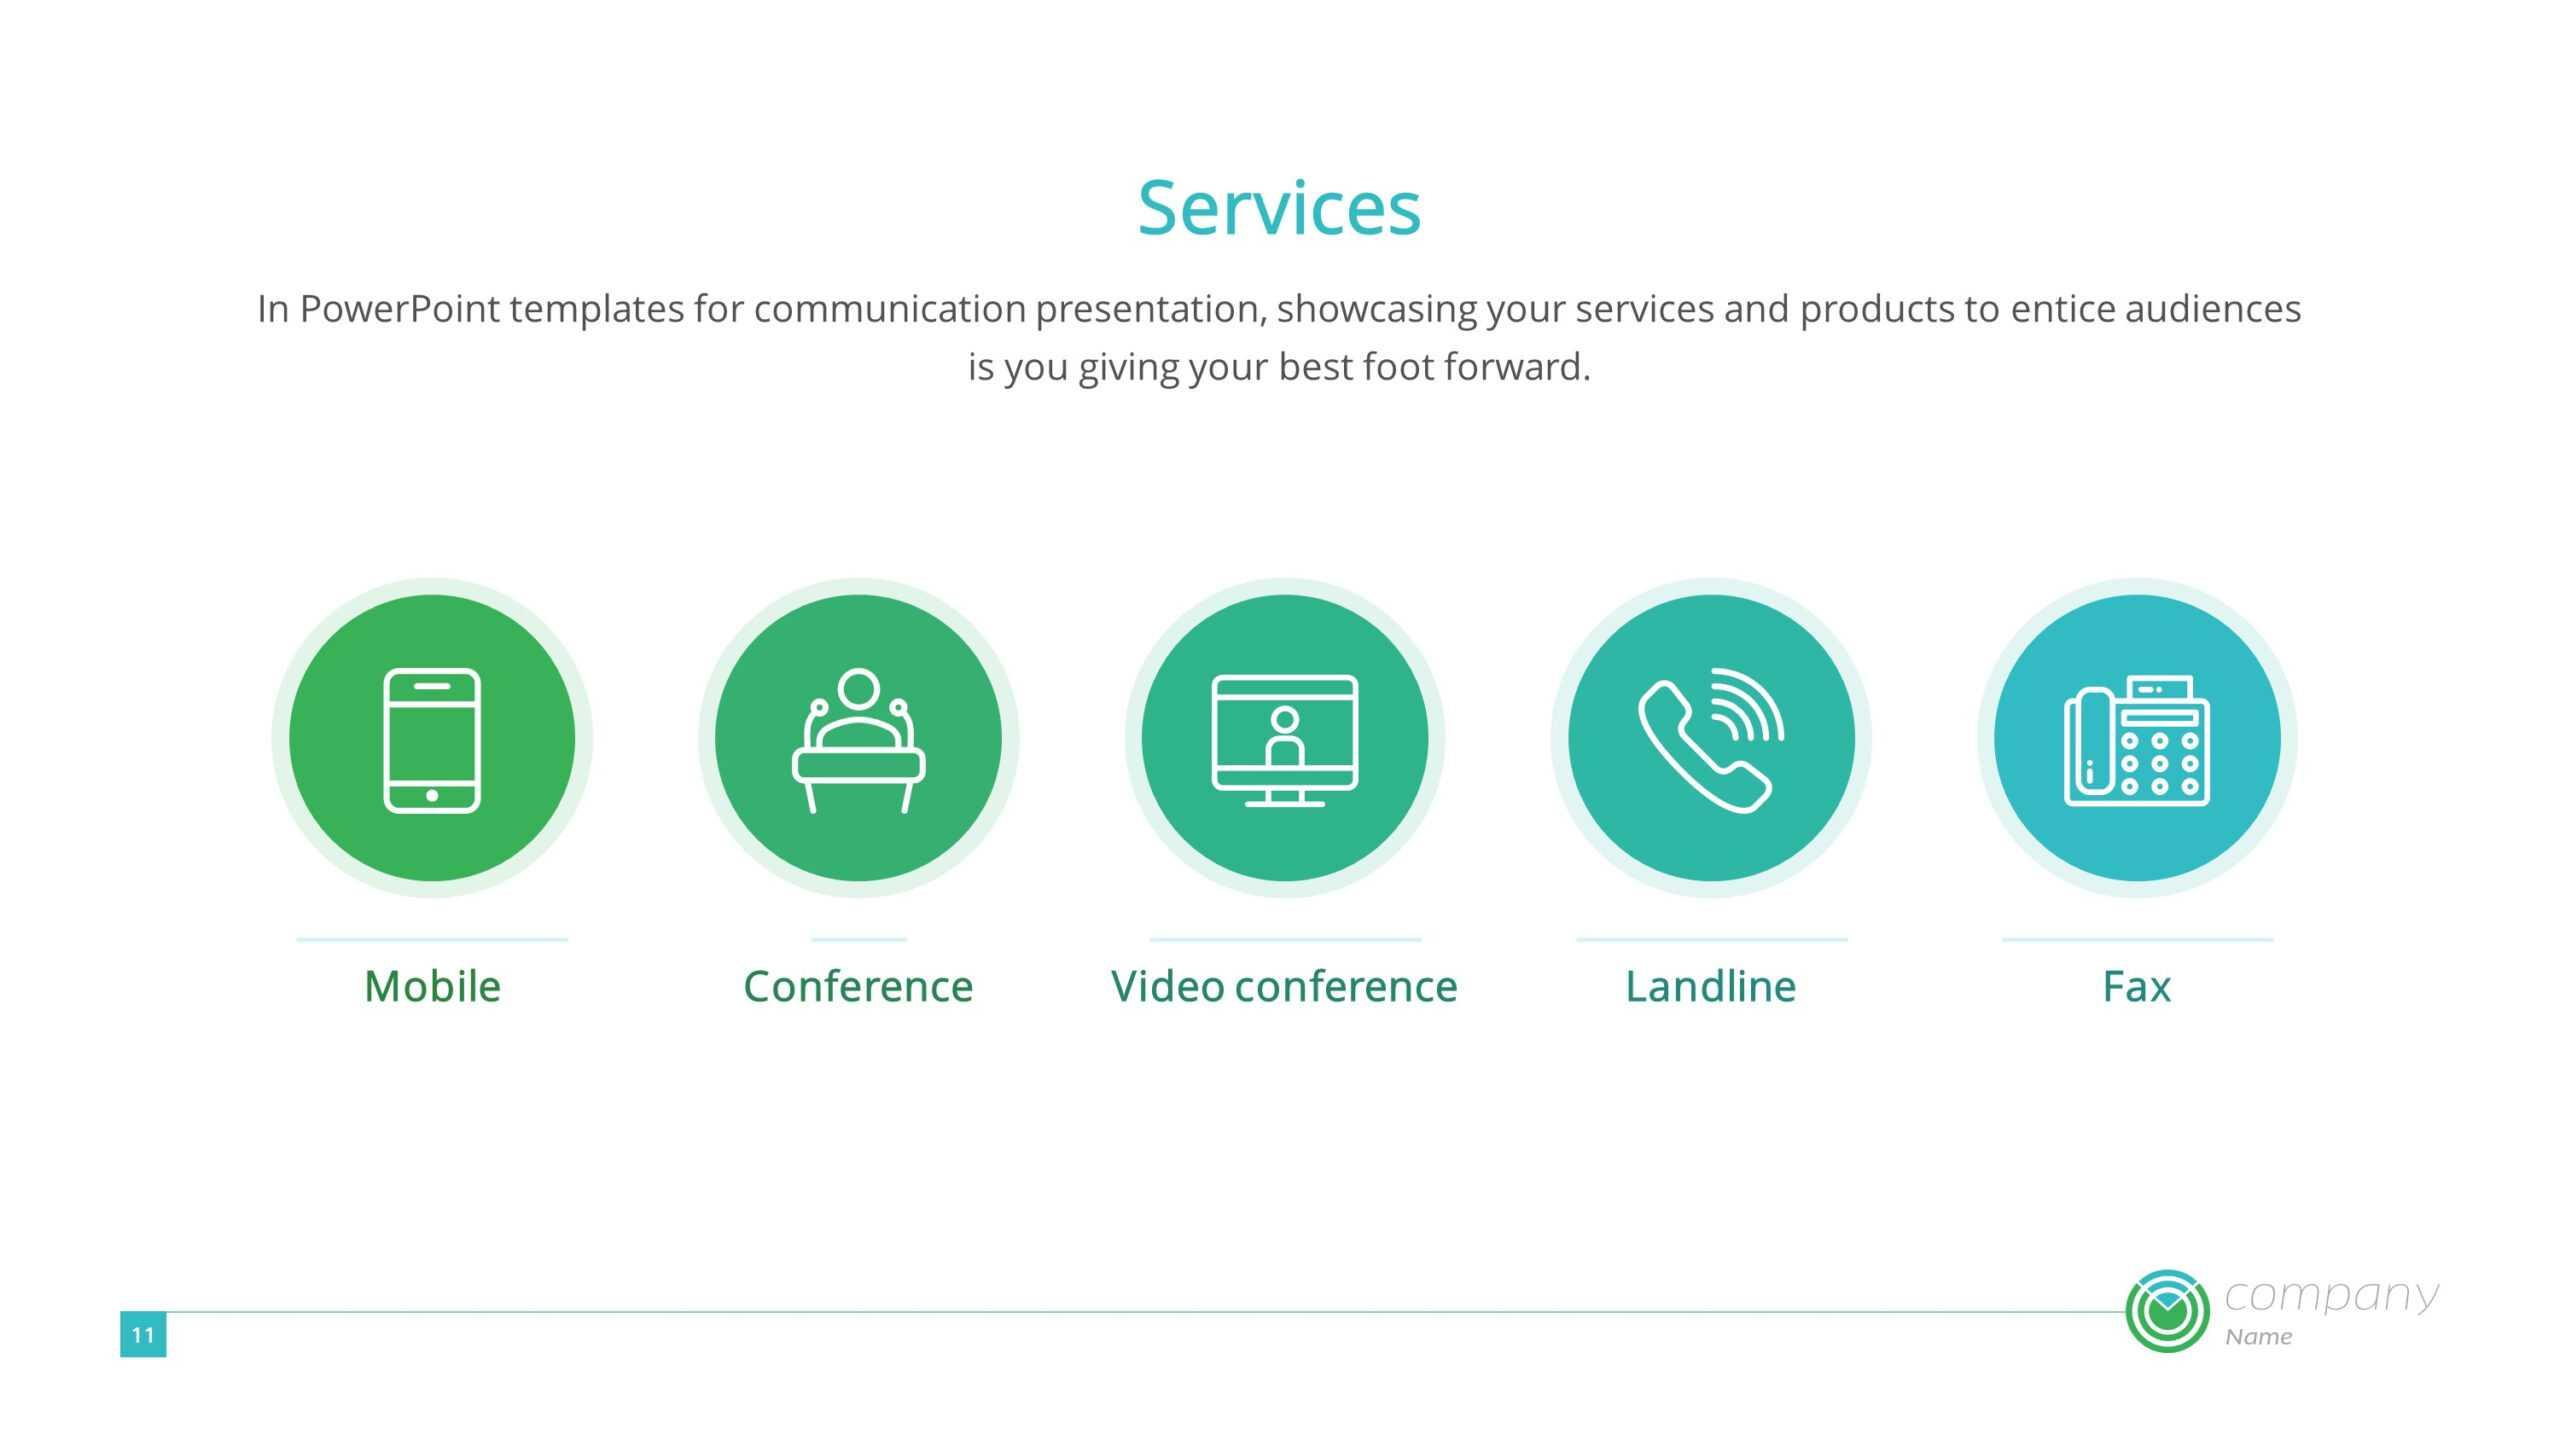 Digital Communication Premium Powerpoint Template - Slidestore For Powerpoint Templates For Communication Presentation